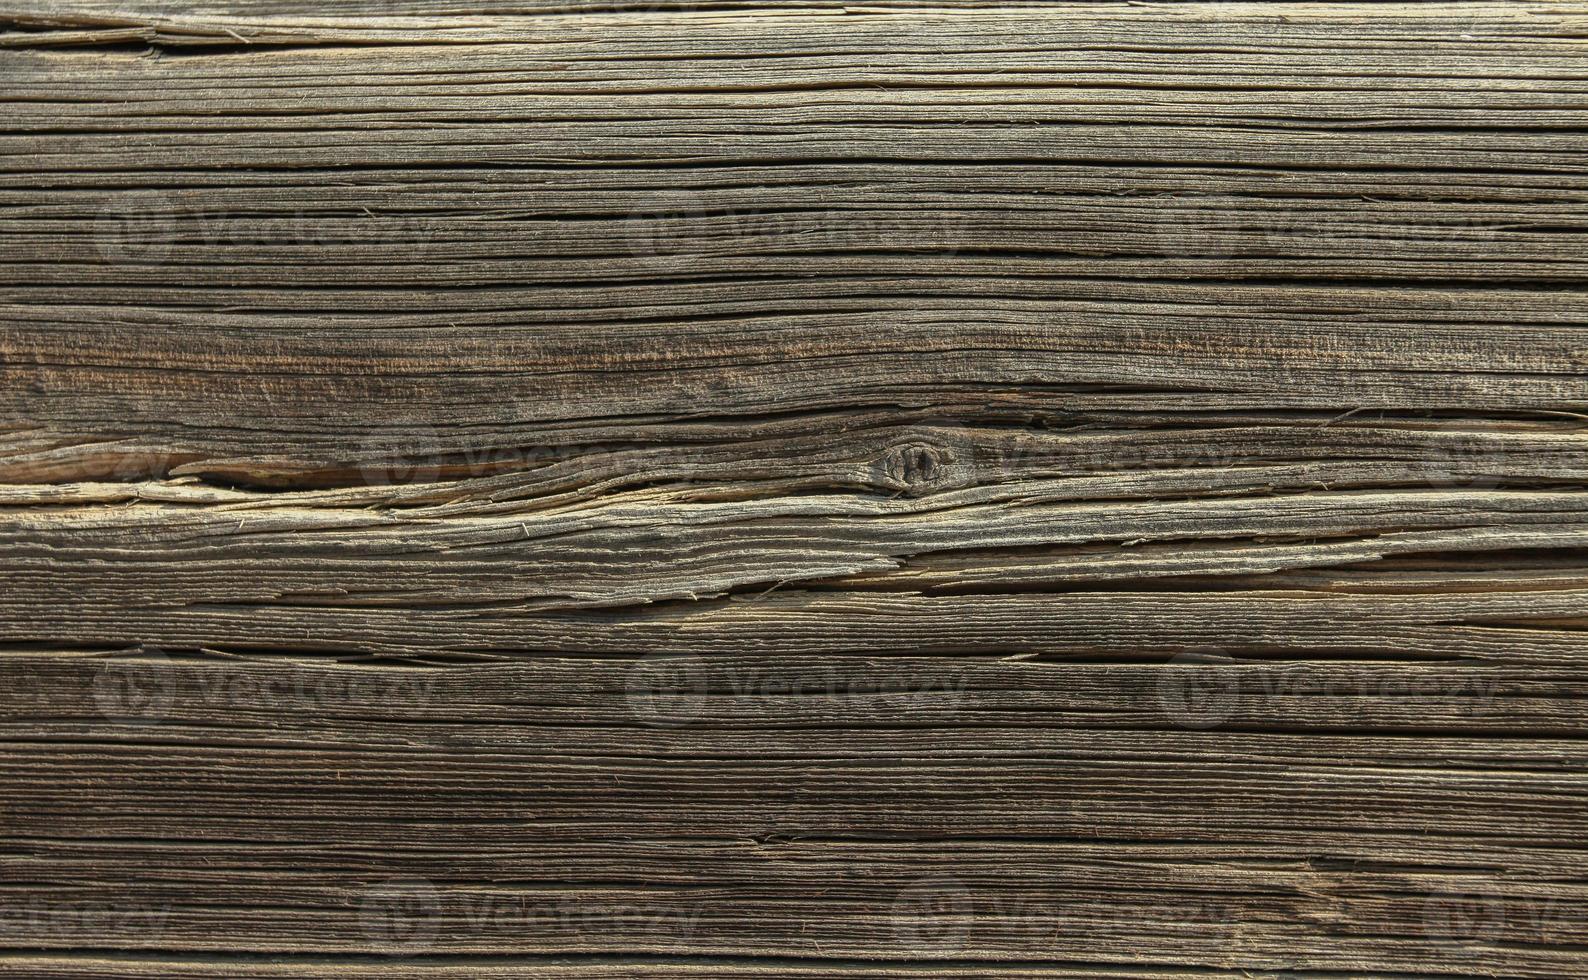 oude houten panelenachtergrond foto